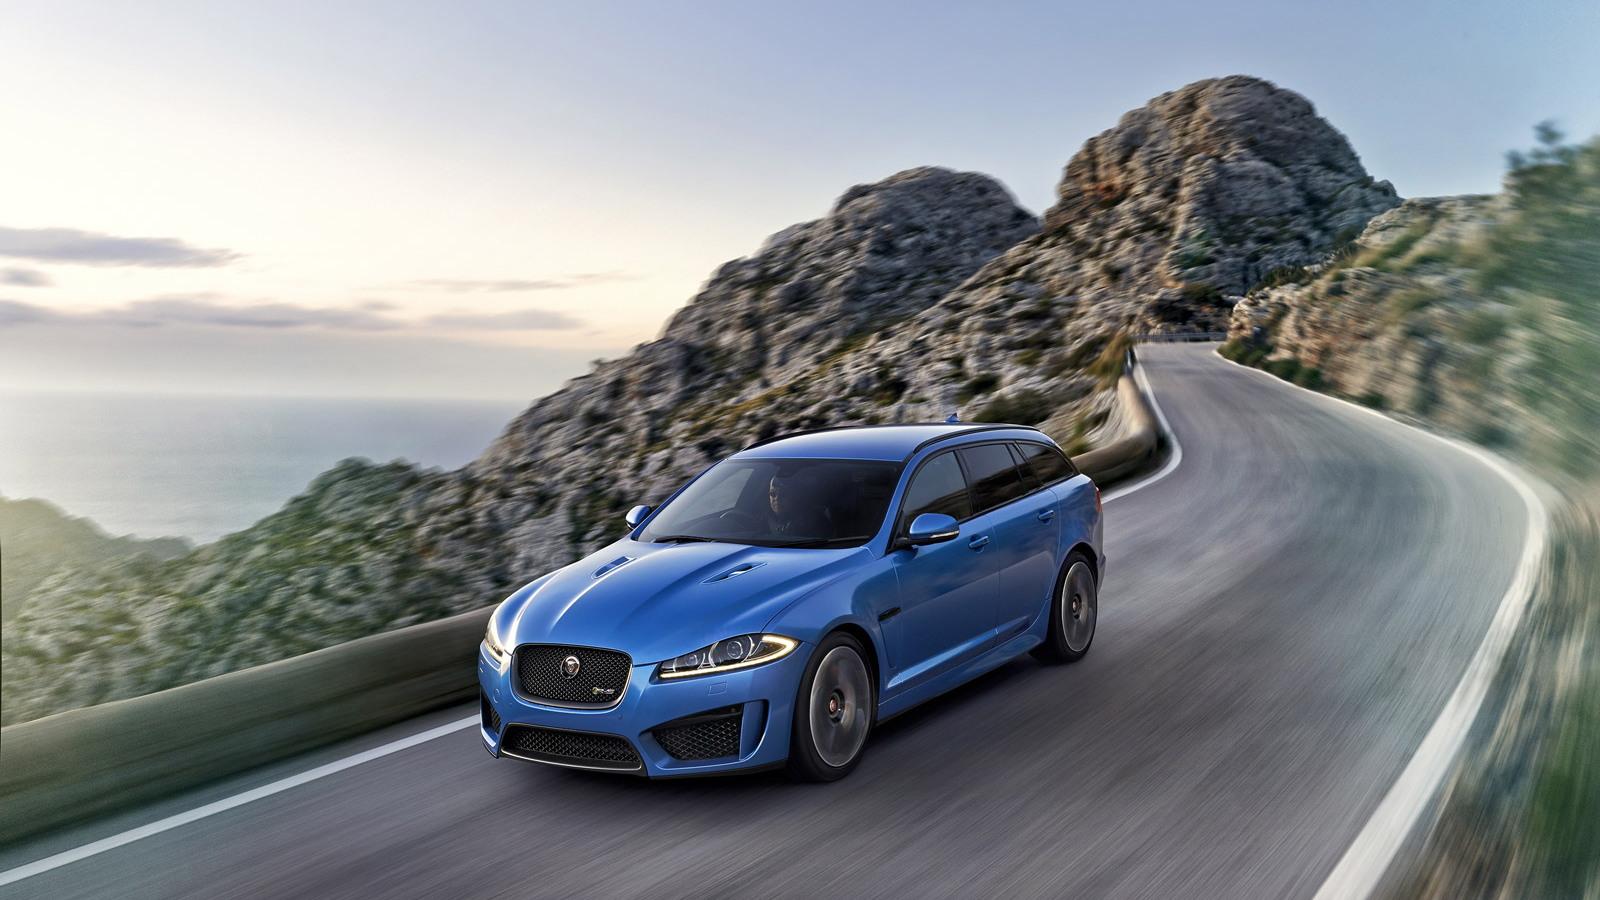 2014 Jaguar XFR-S Sportbrake Revealed Ahead Of Geneva ...